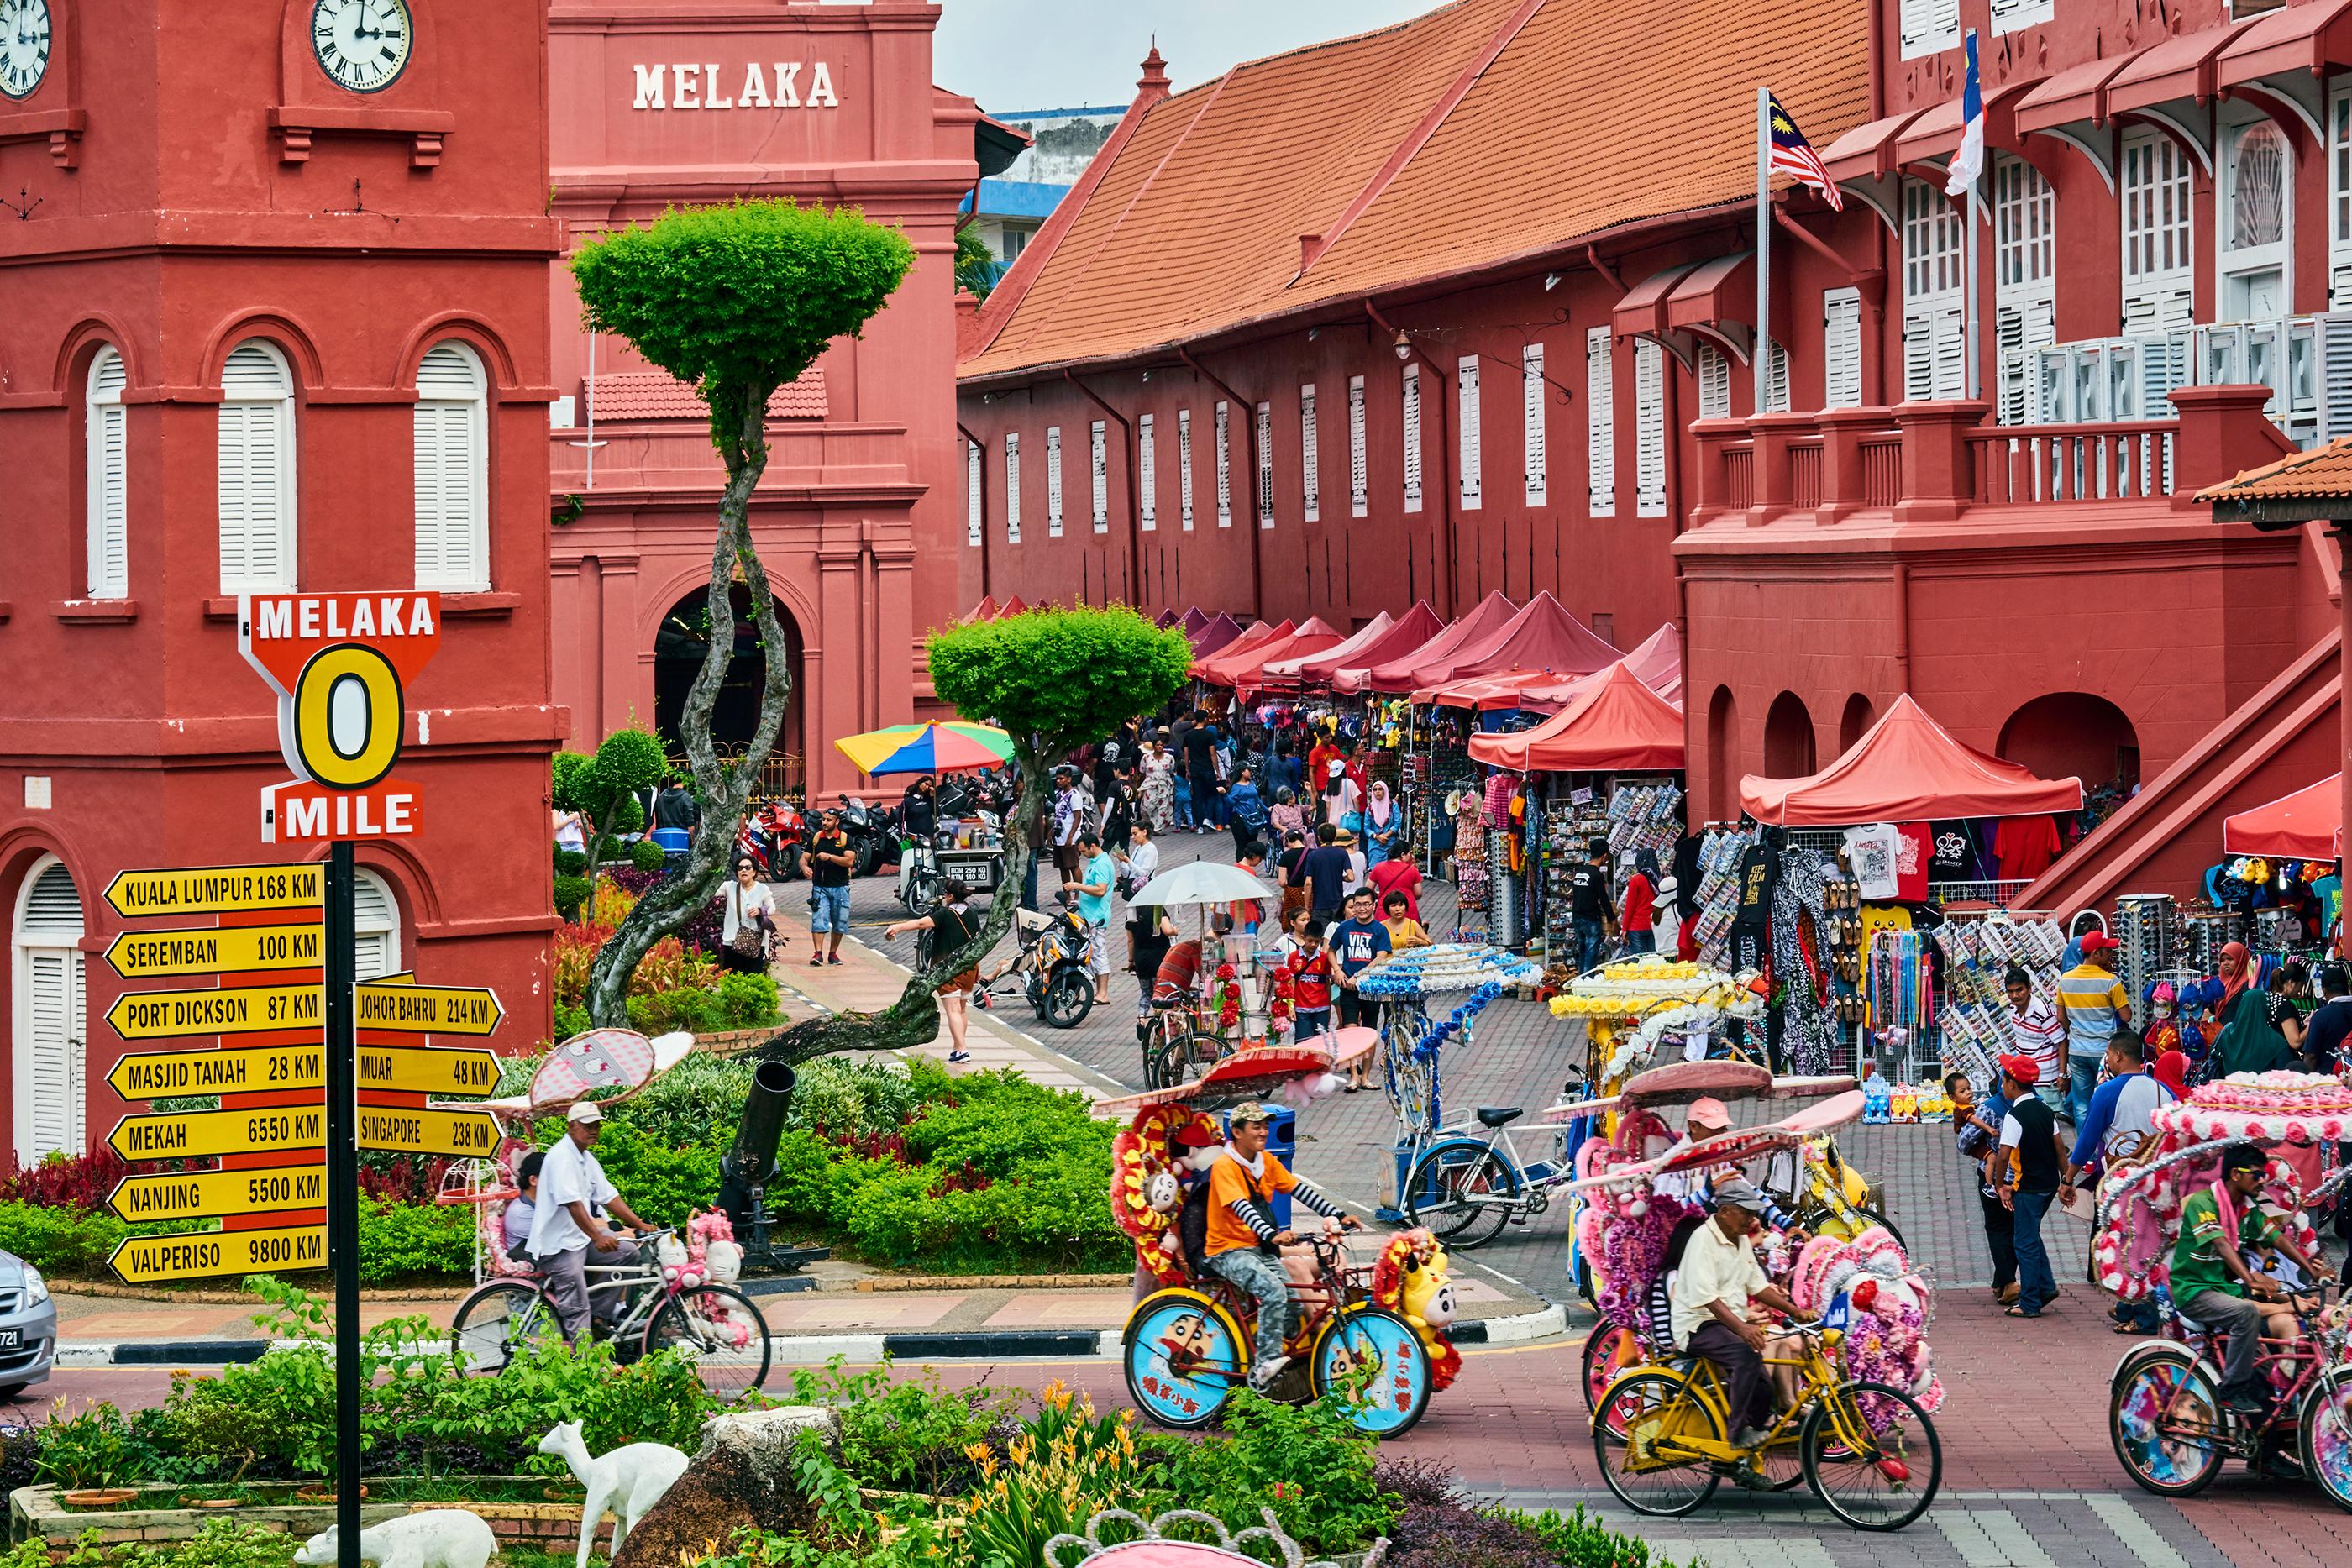 City square, Malacca, Unesco Wold Heritage, Malaysia